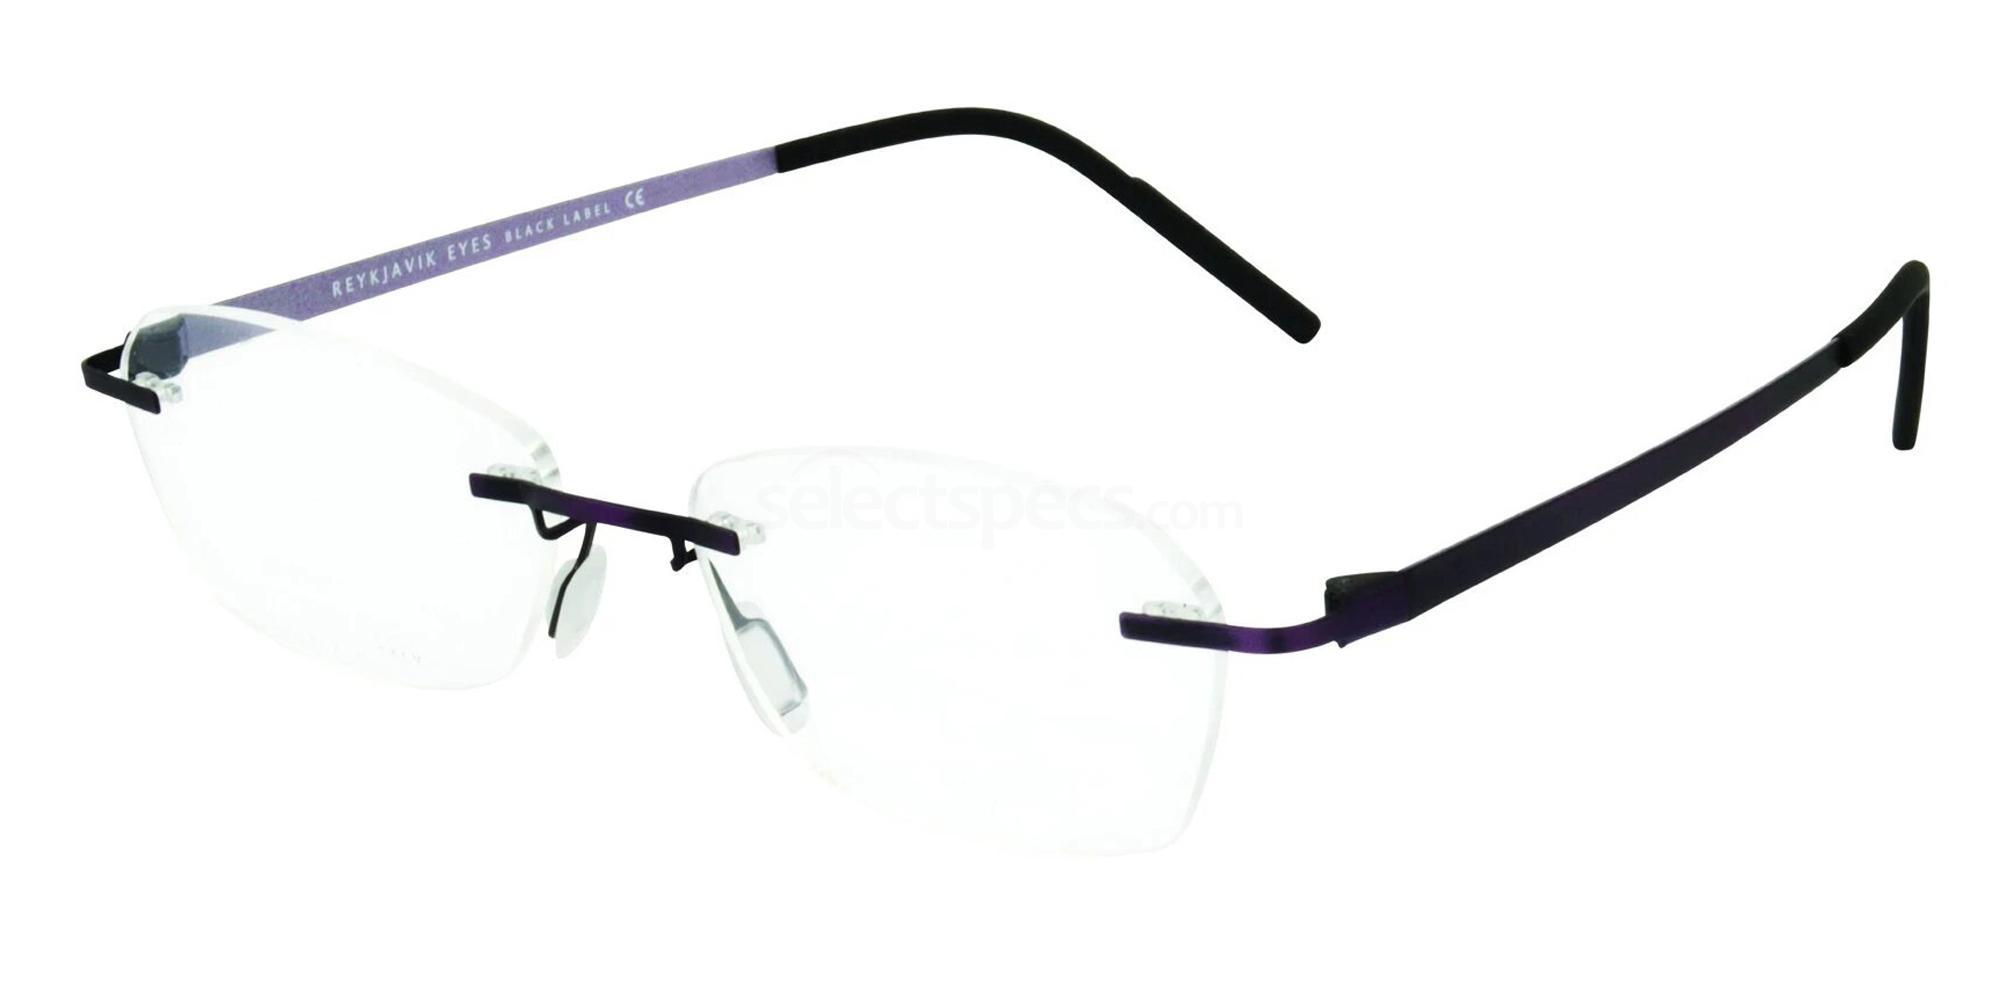 С1 MARTA Glasses, Reykjavik Eyes Black Label